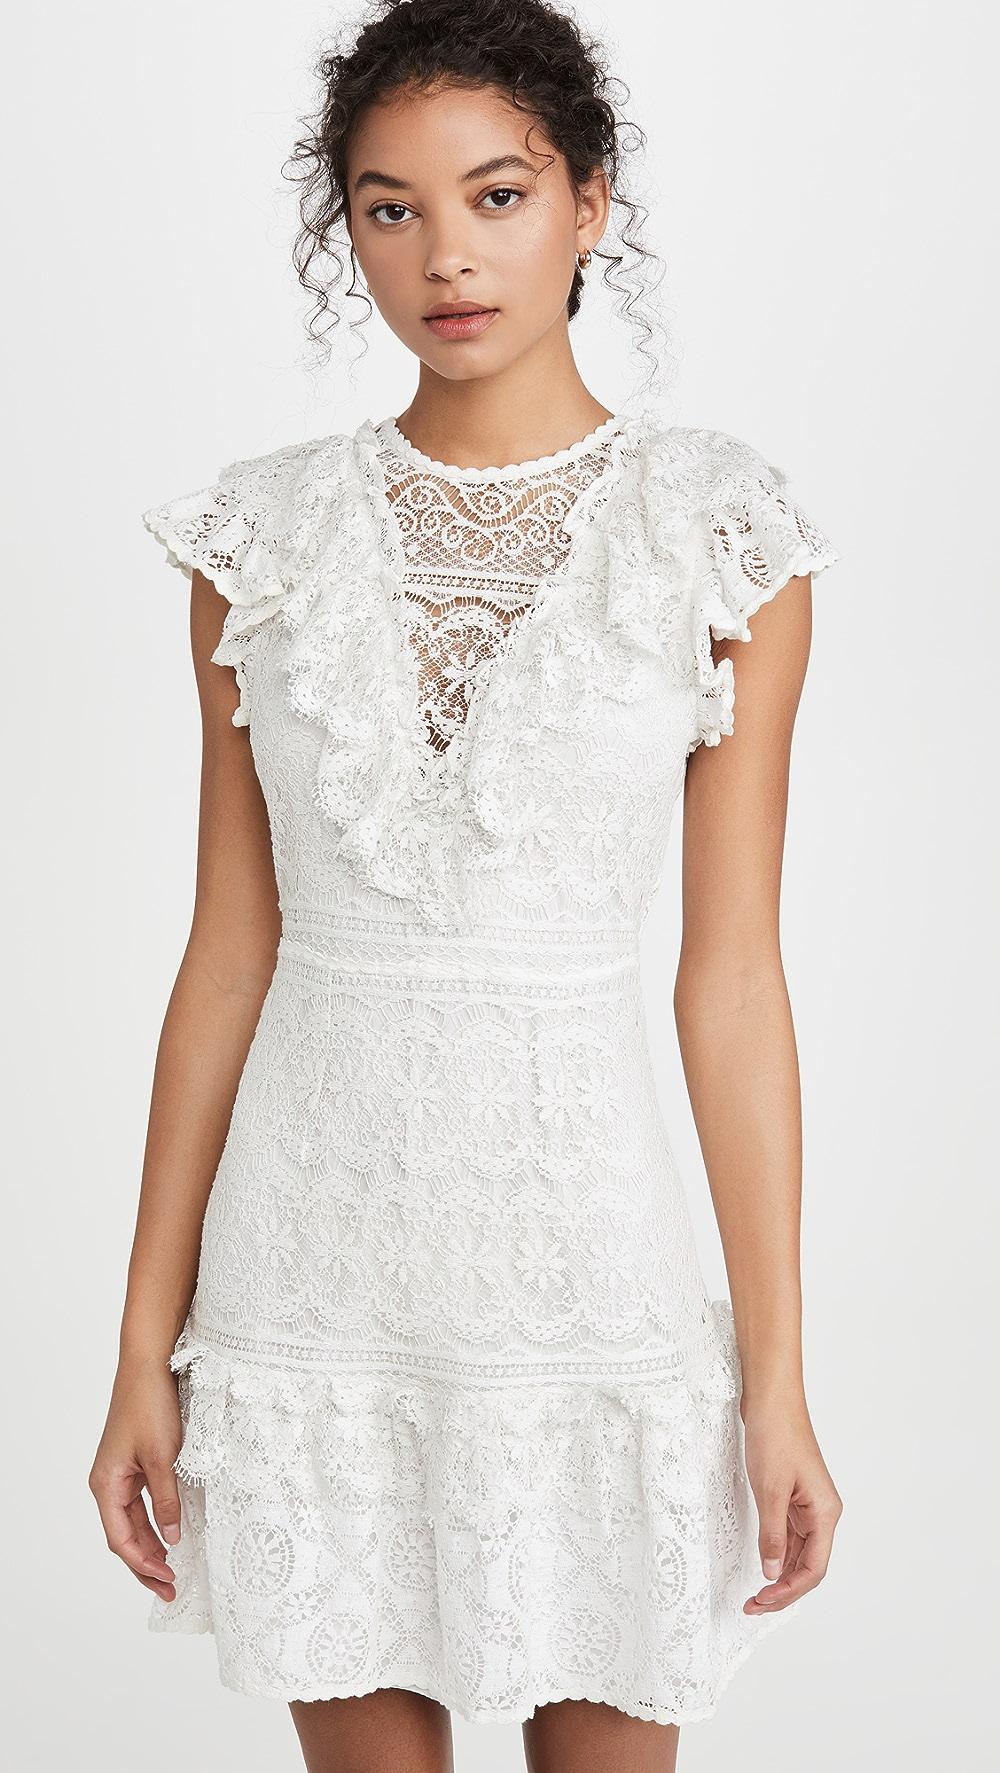 2019 Latest Design Saylor - Maxie Dress Year-End Bargain Sale